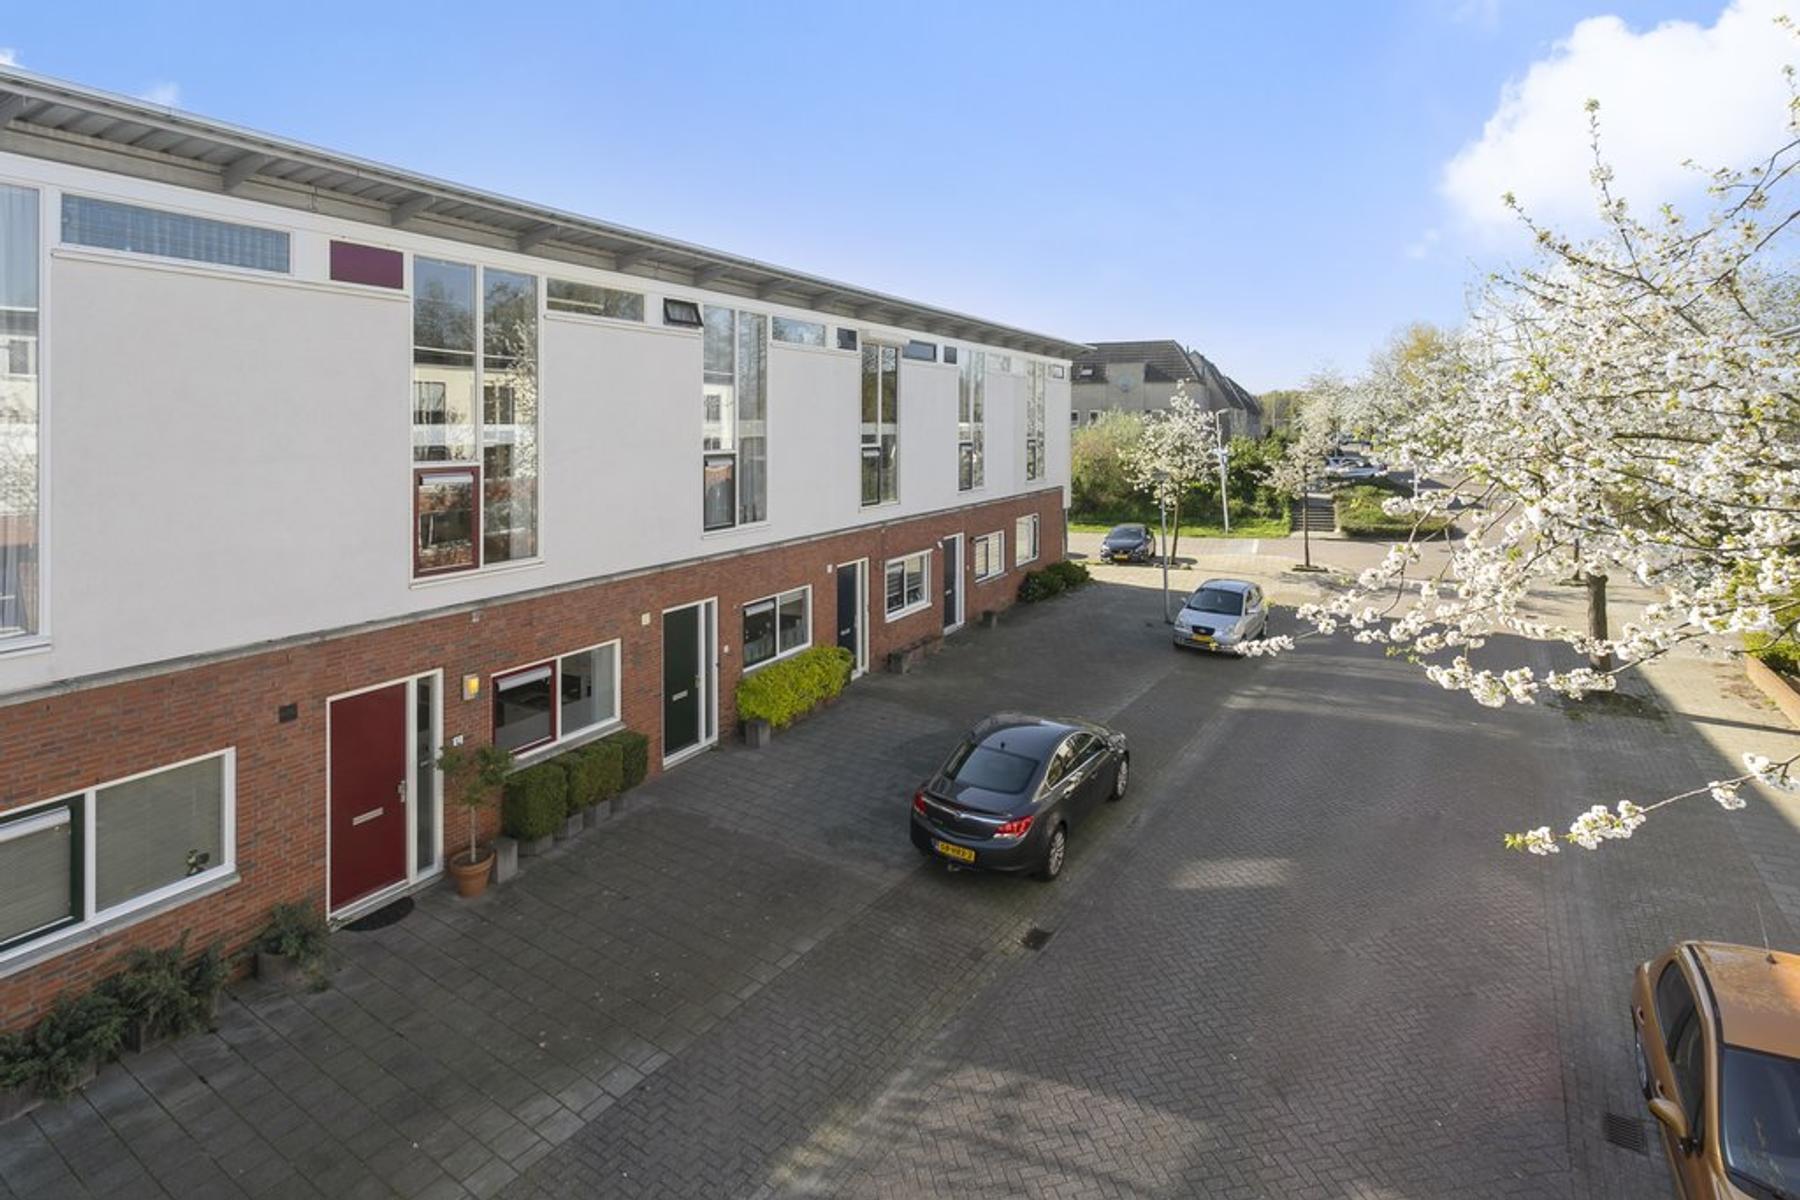 Annette Versluysstraat 10 in Deventer 7421 LB